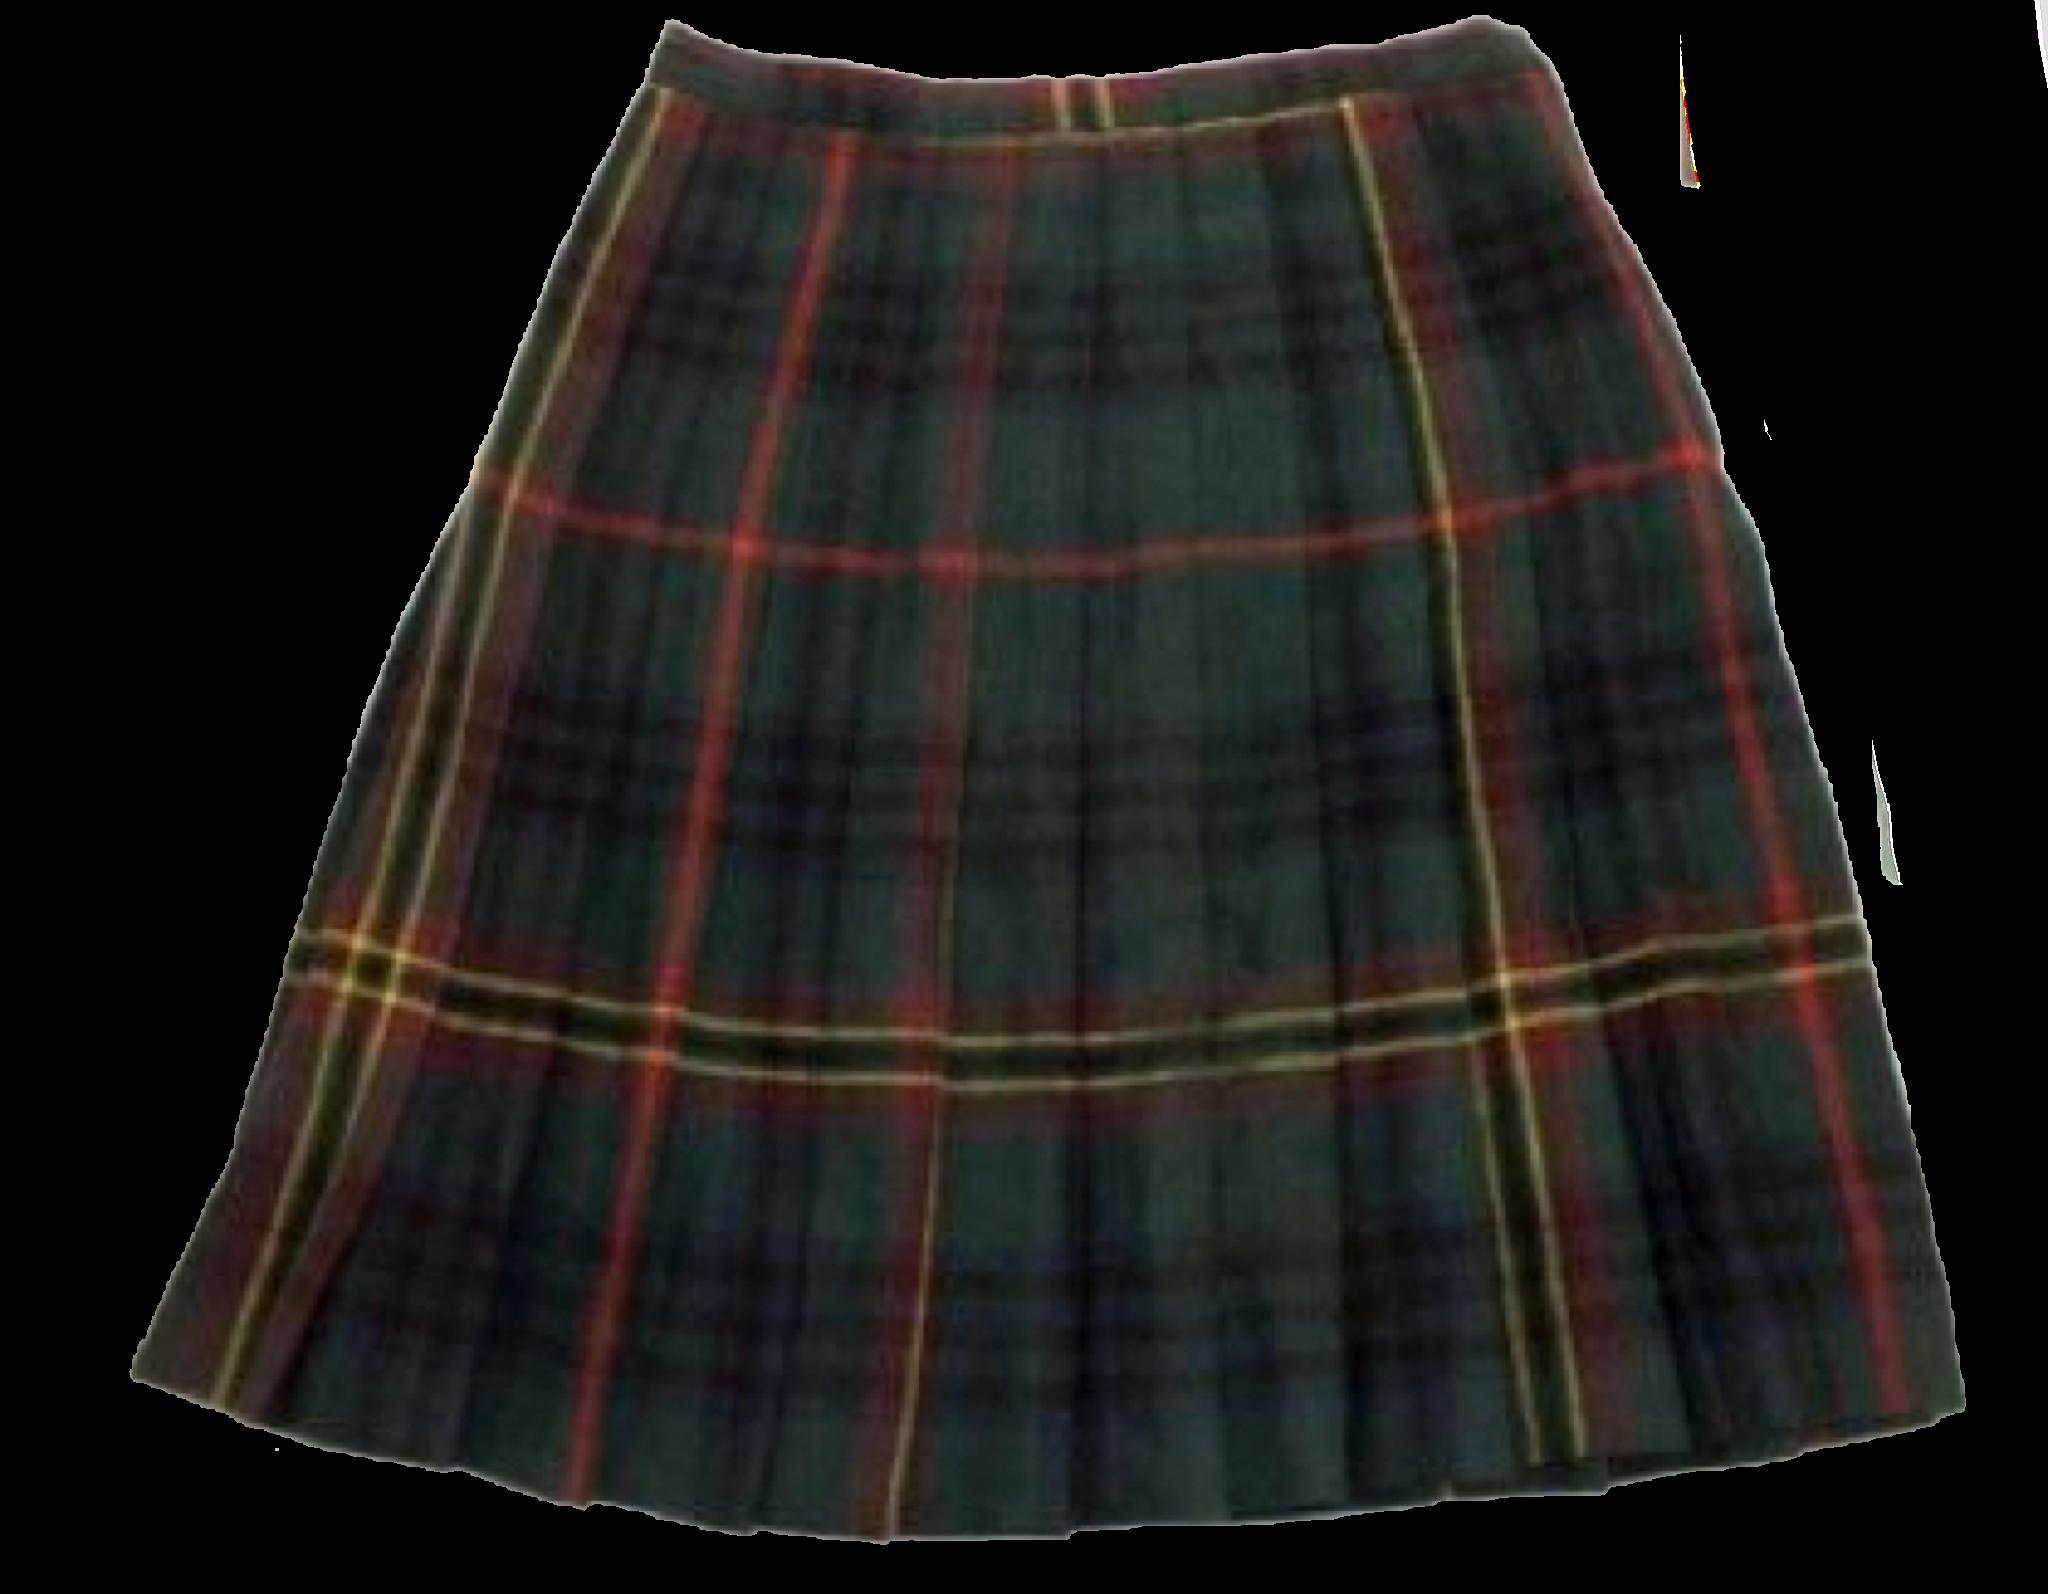 da714c0871 Blue Plaid Skirt, Plaid Wool Skirt, Wool Mini Skirt, Tartan Pleated Skirt,